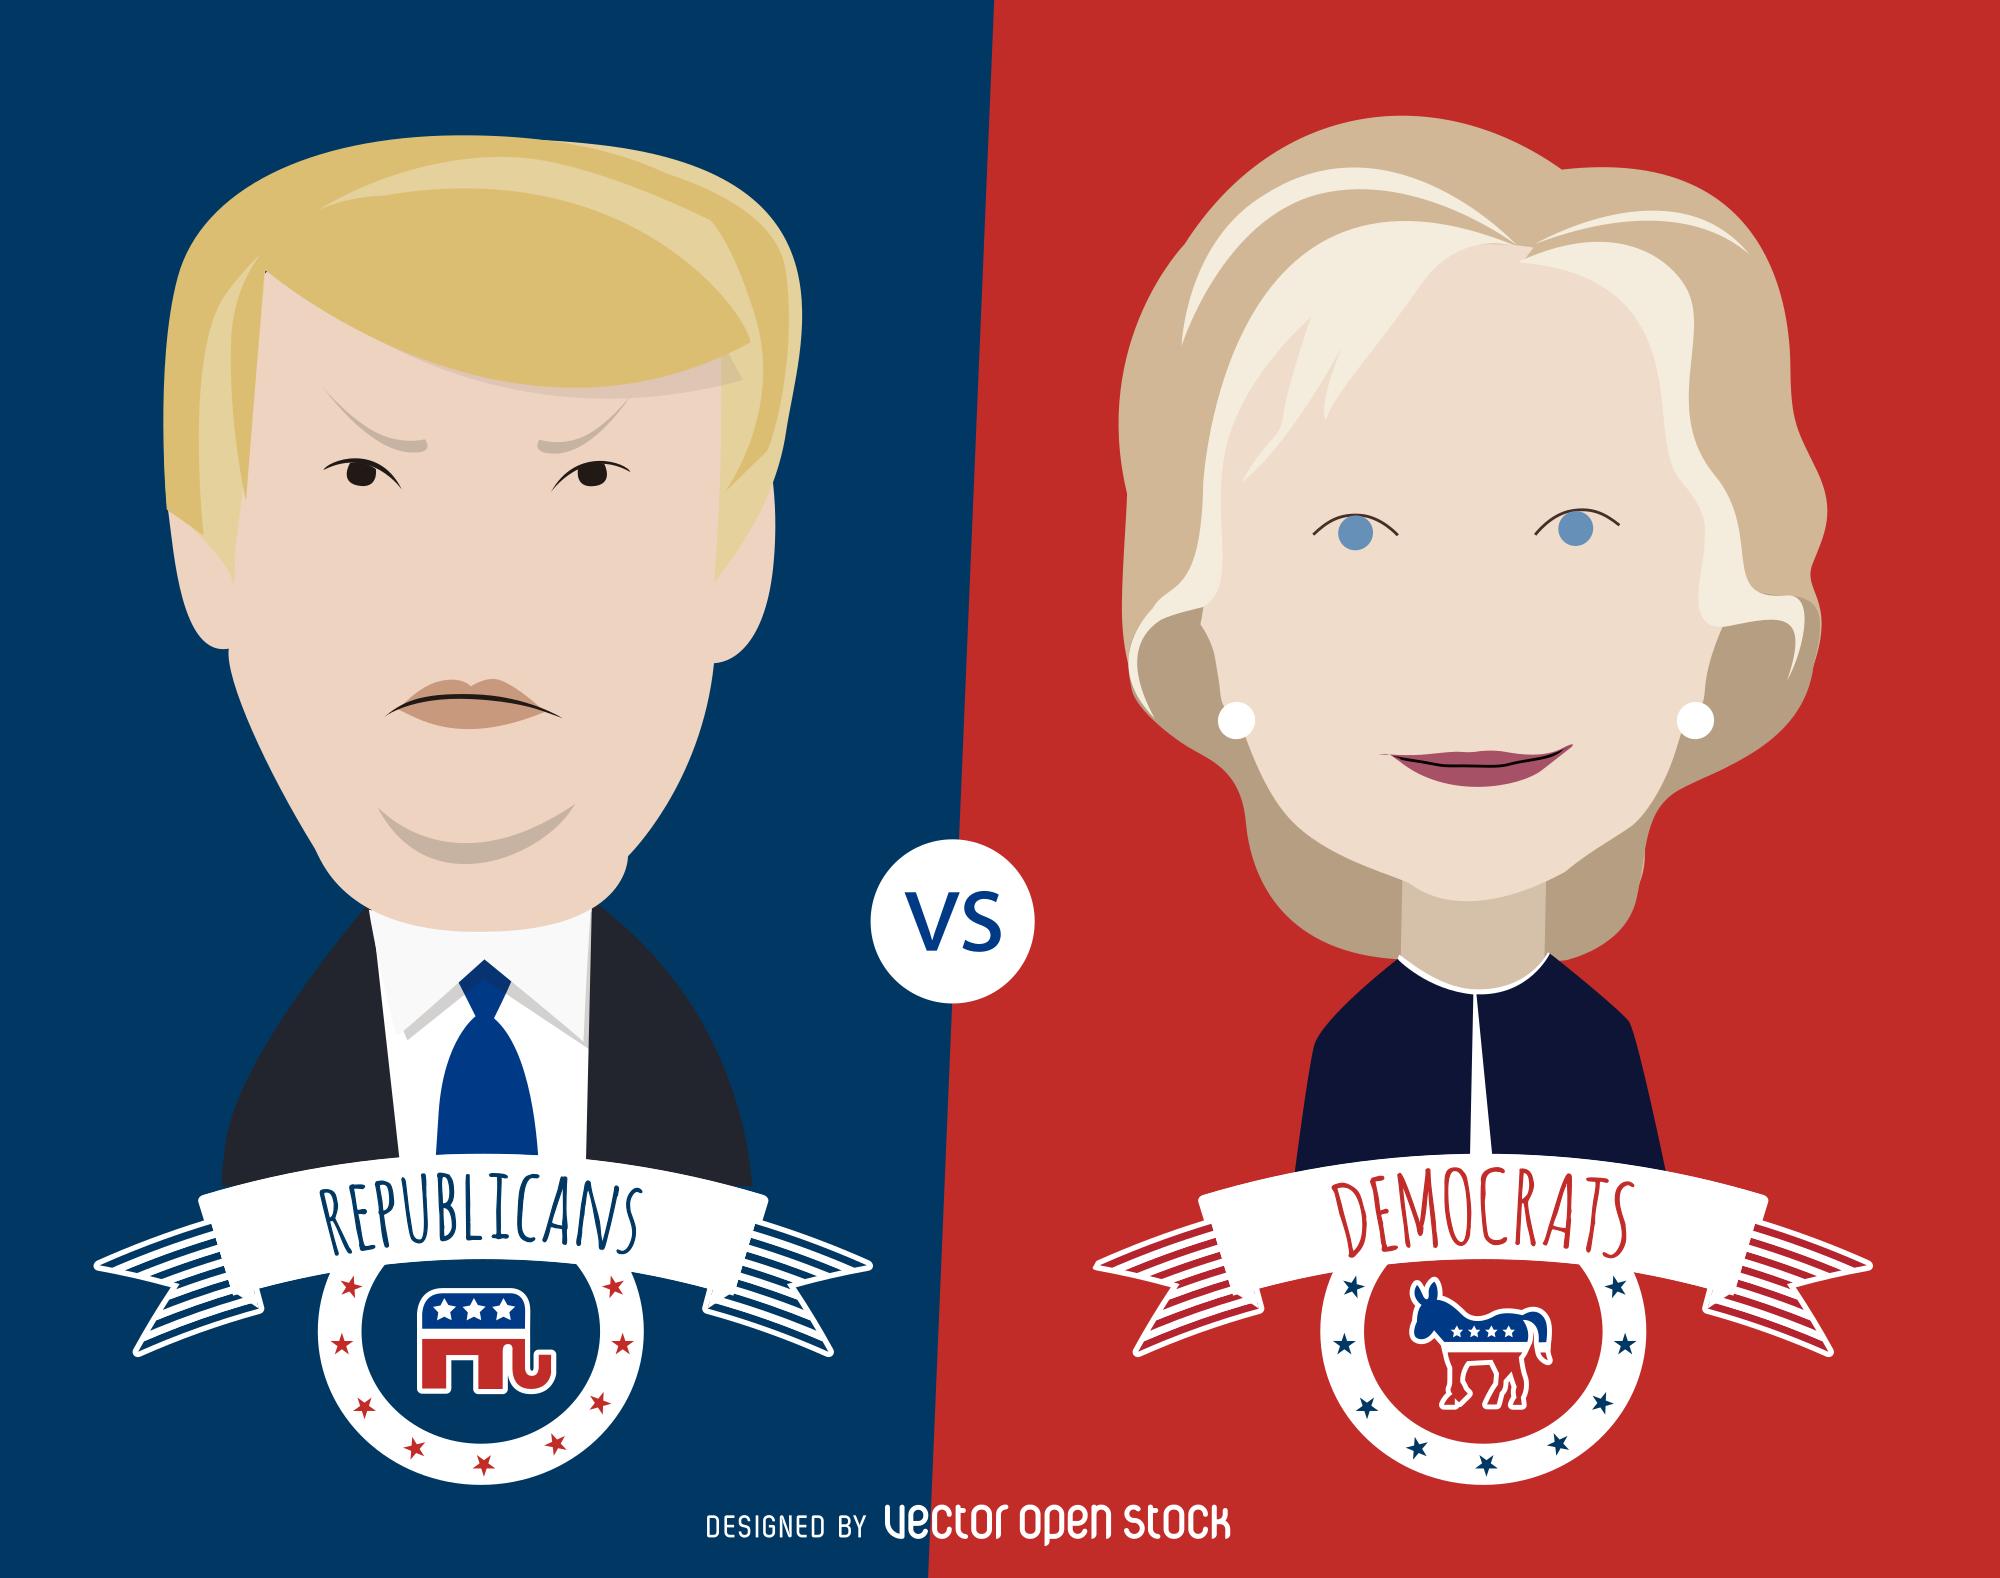 2000x1578 Fileusavector 022 01 Clinton And Trump Cartoon Illustration.svg